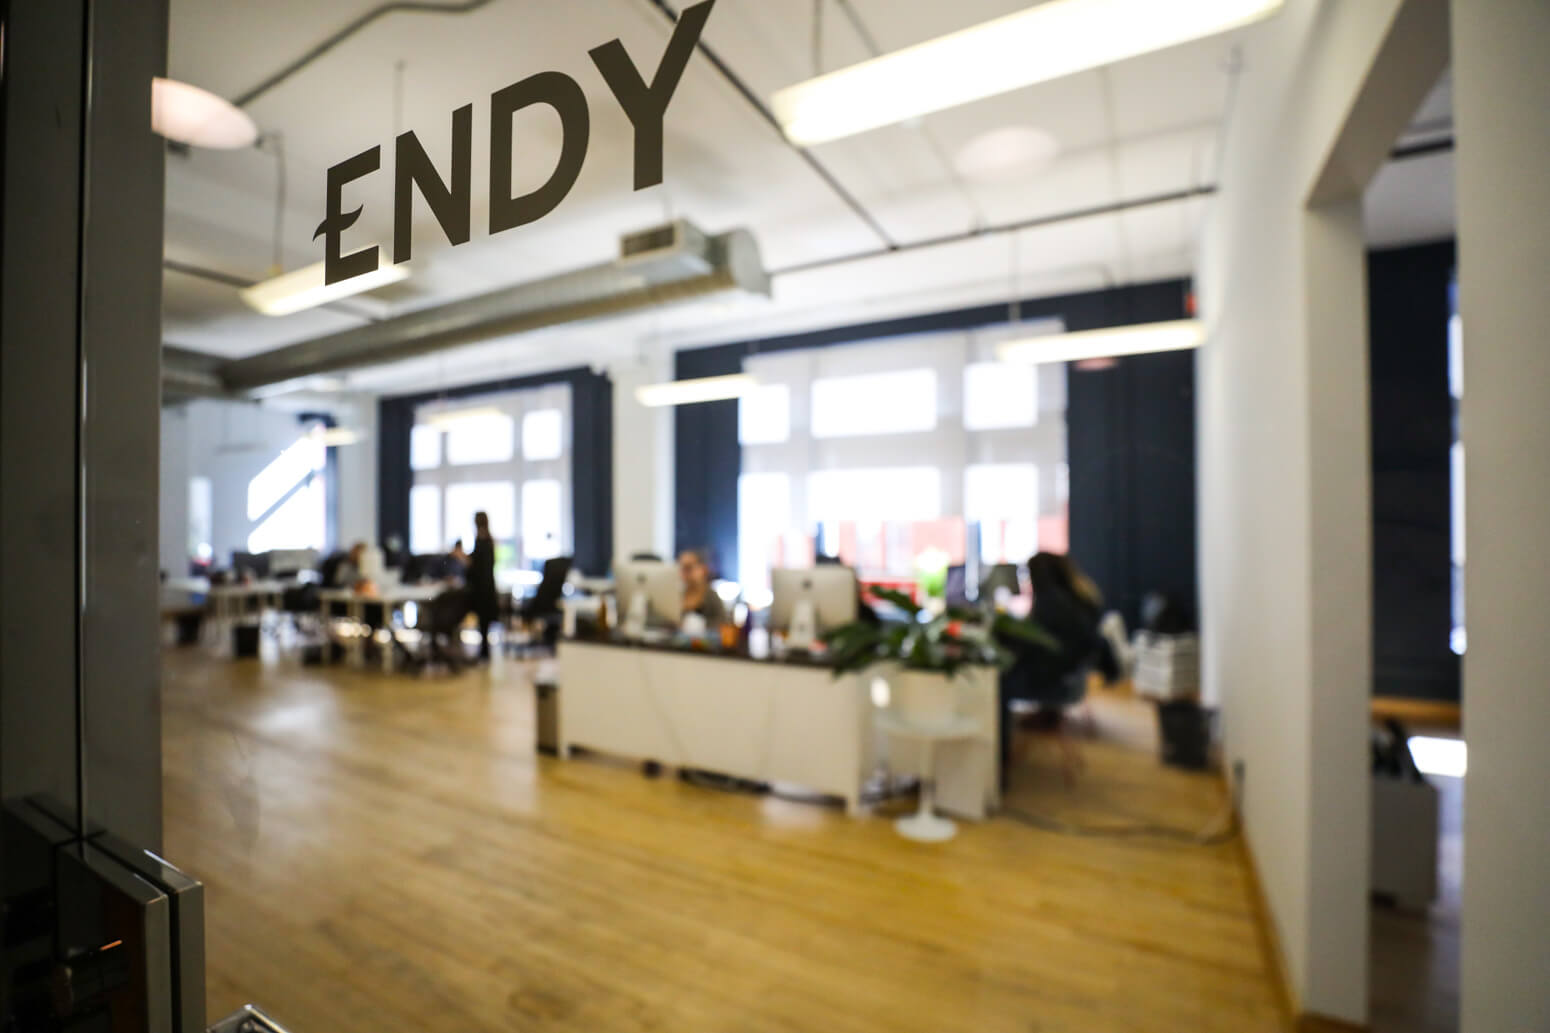 Endy Sleep Office Techvibes-6